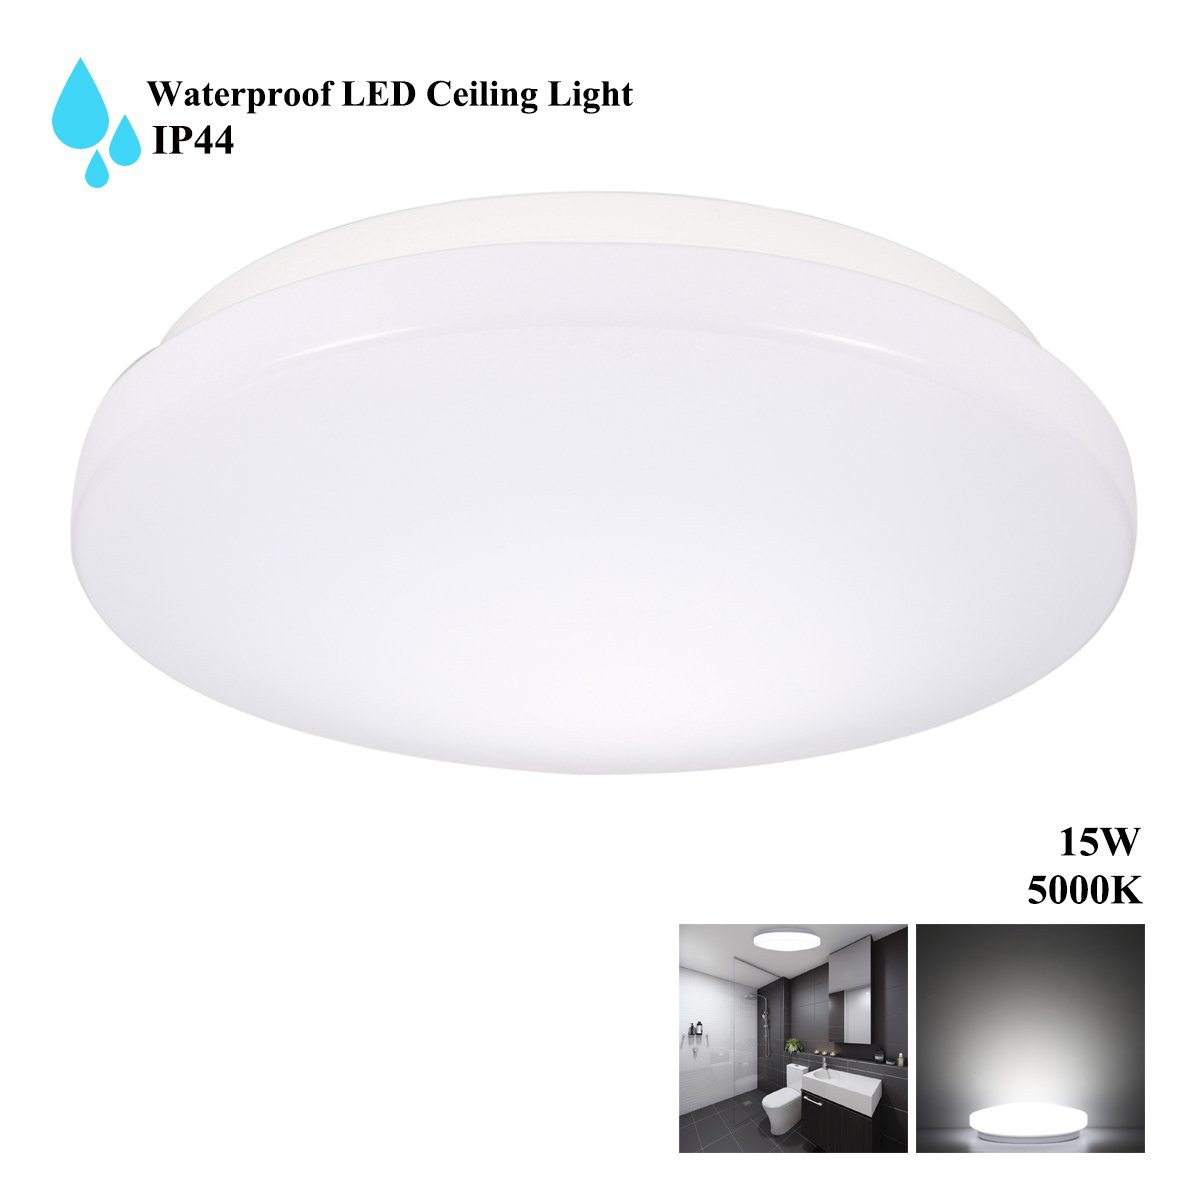 IP44 Waterproof LED Ceiling light S&G 15W Bathroom Ceiling Light ...